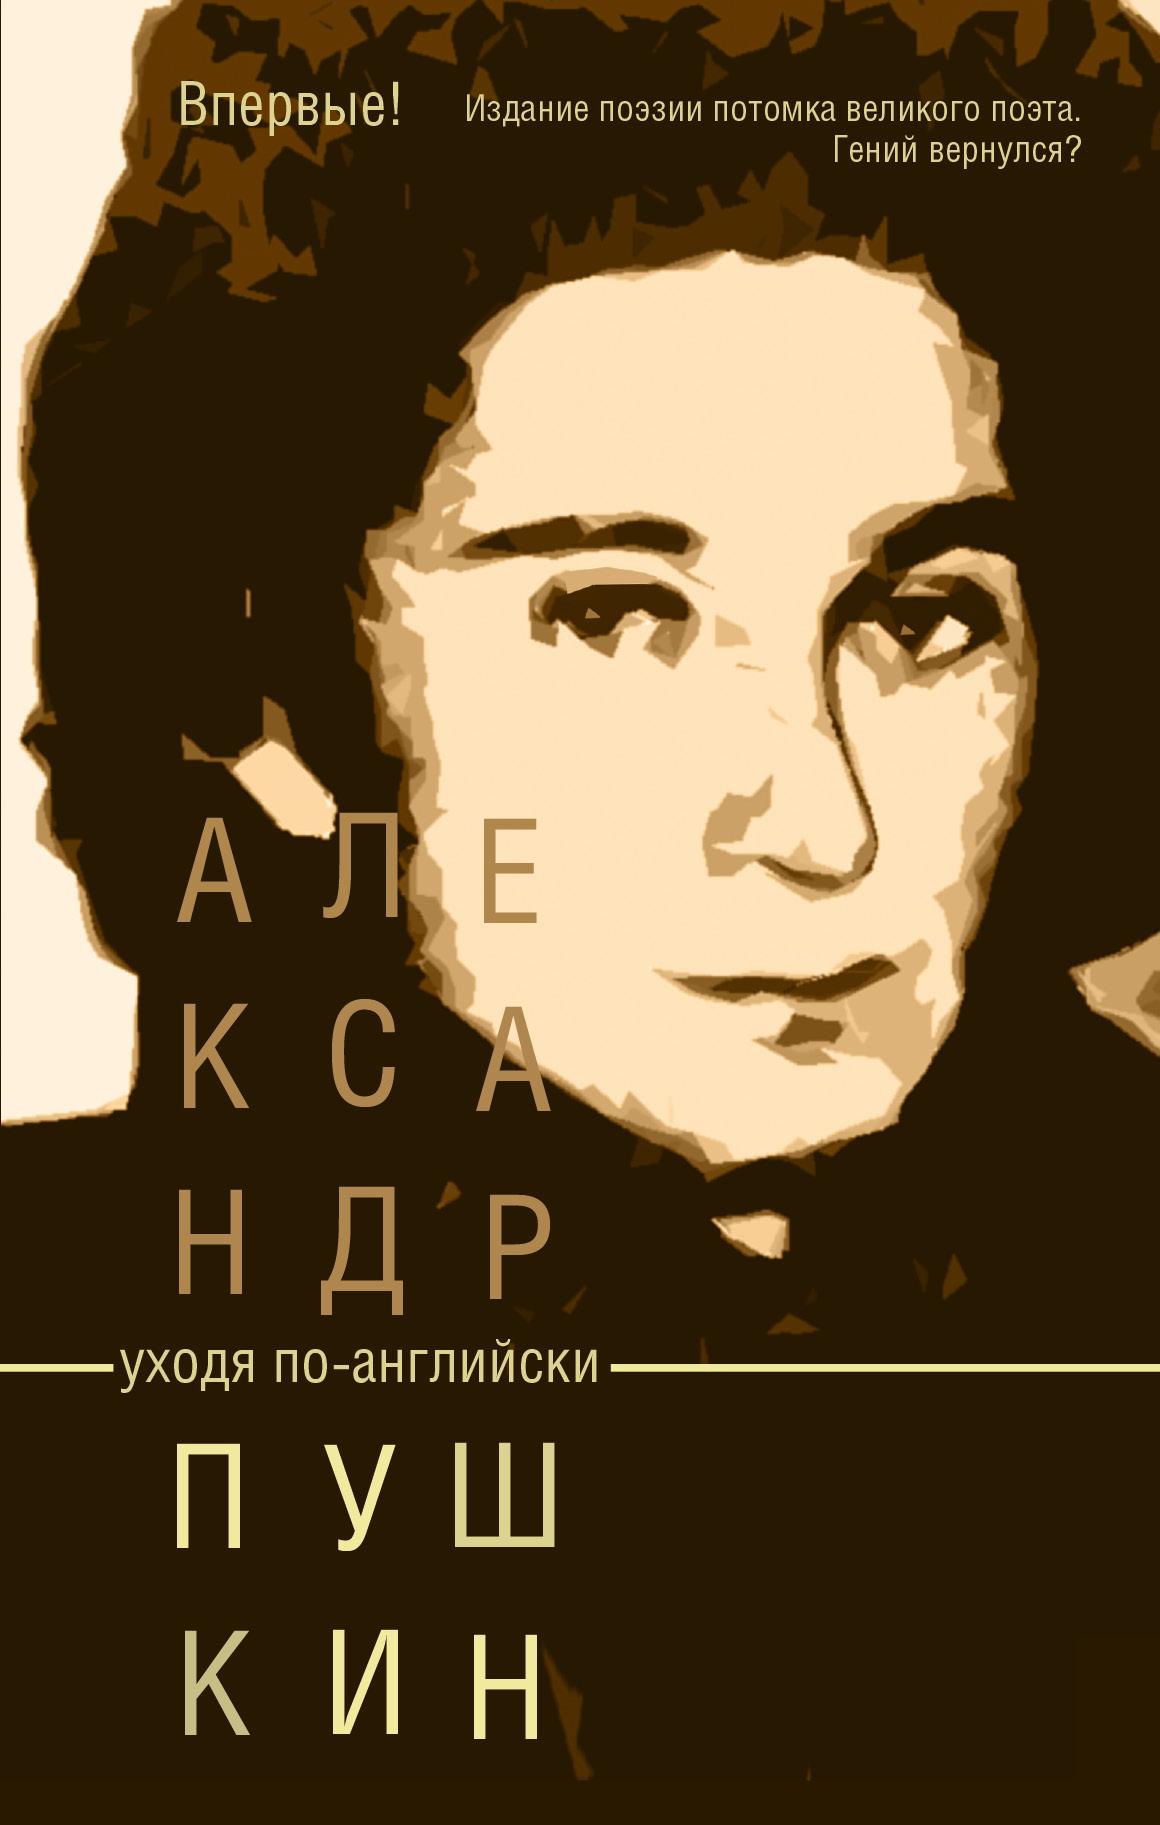 Александр Пушкин Уходя по-английски александр пушкин уходя по английски